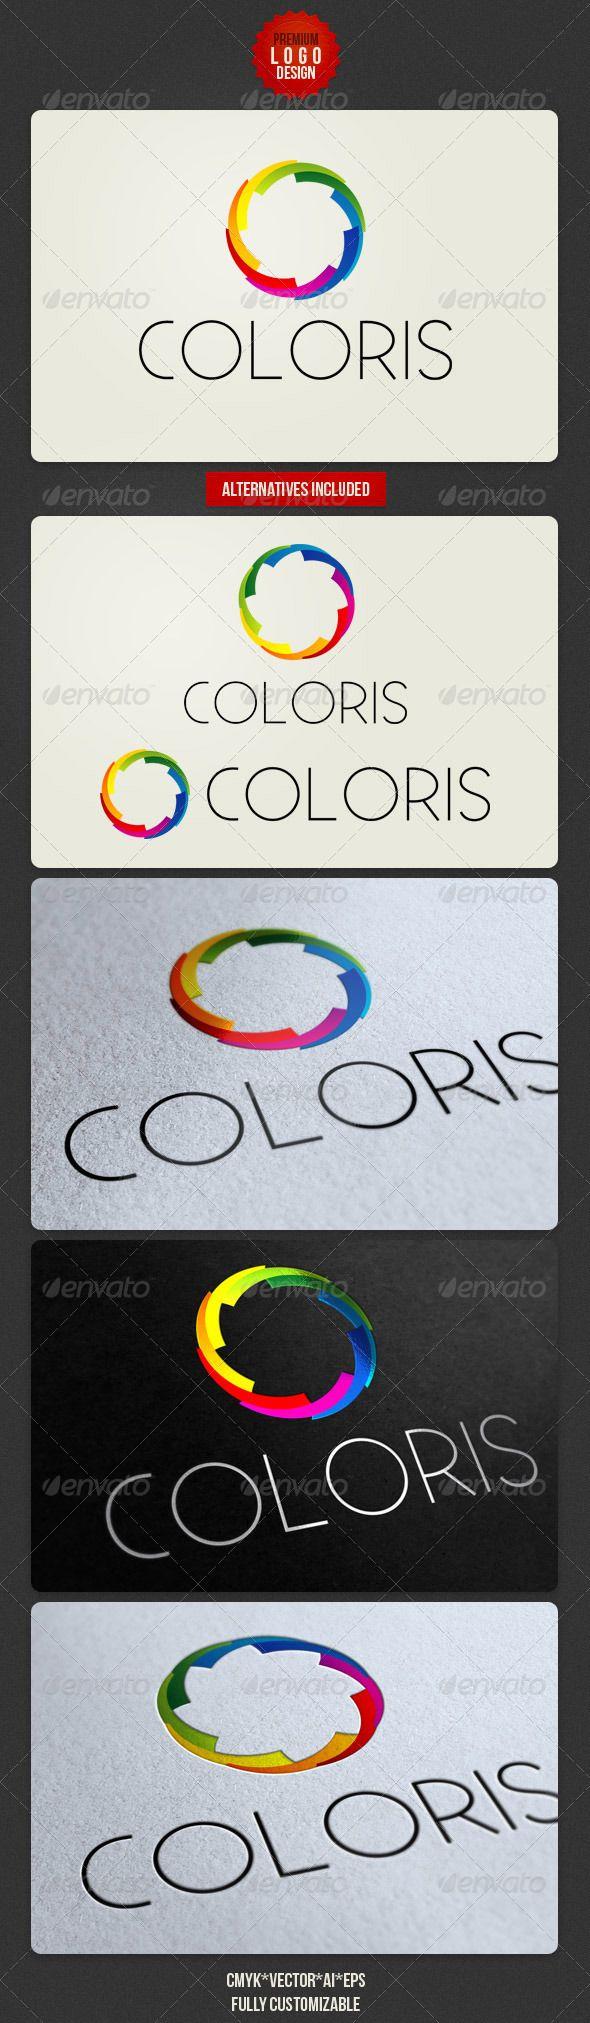 59 best logo templates images on pinterest script fonts adobe coloris clean logo design pronofoot35fo Choice Image